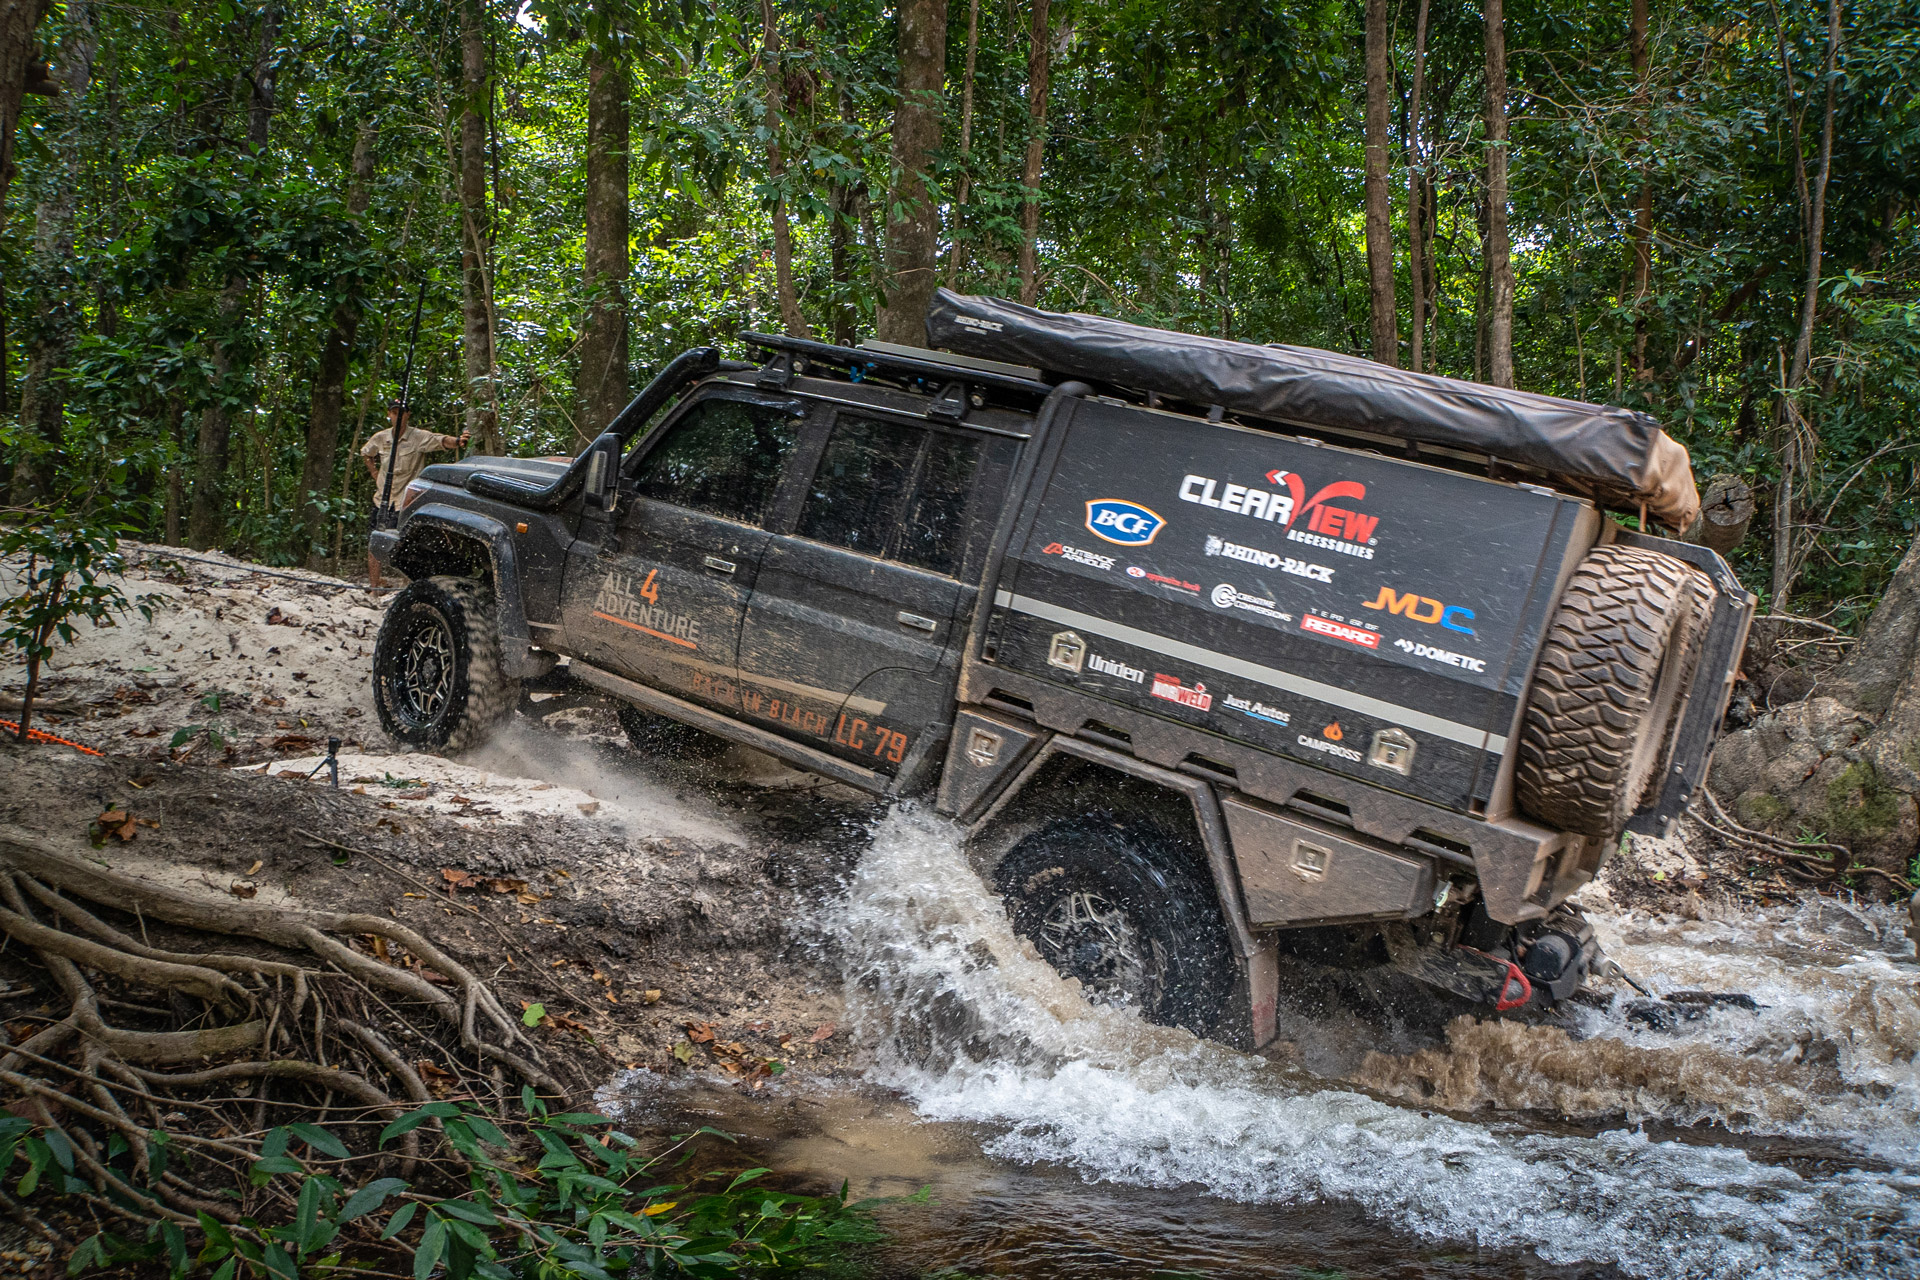 ROH Maverick 4x4 black wheels on 79 series Landcruiser going through river